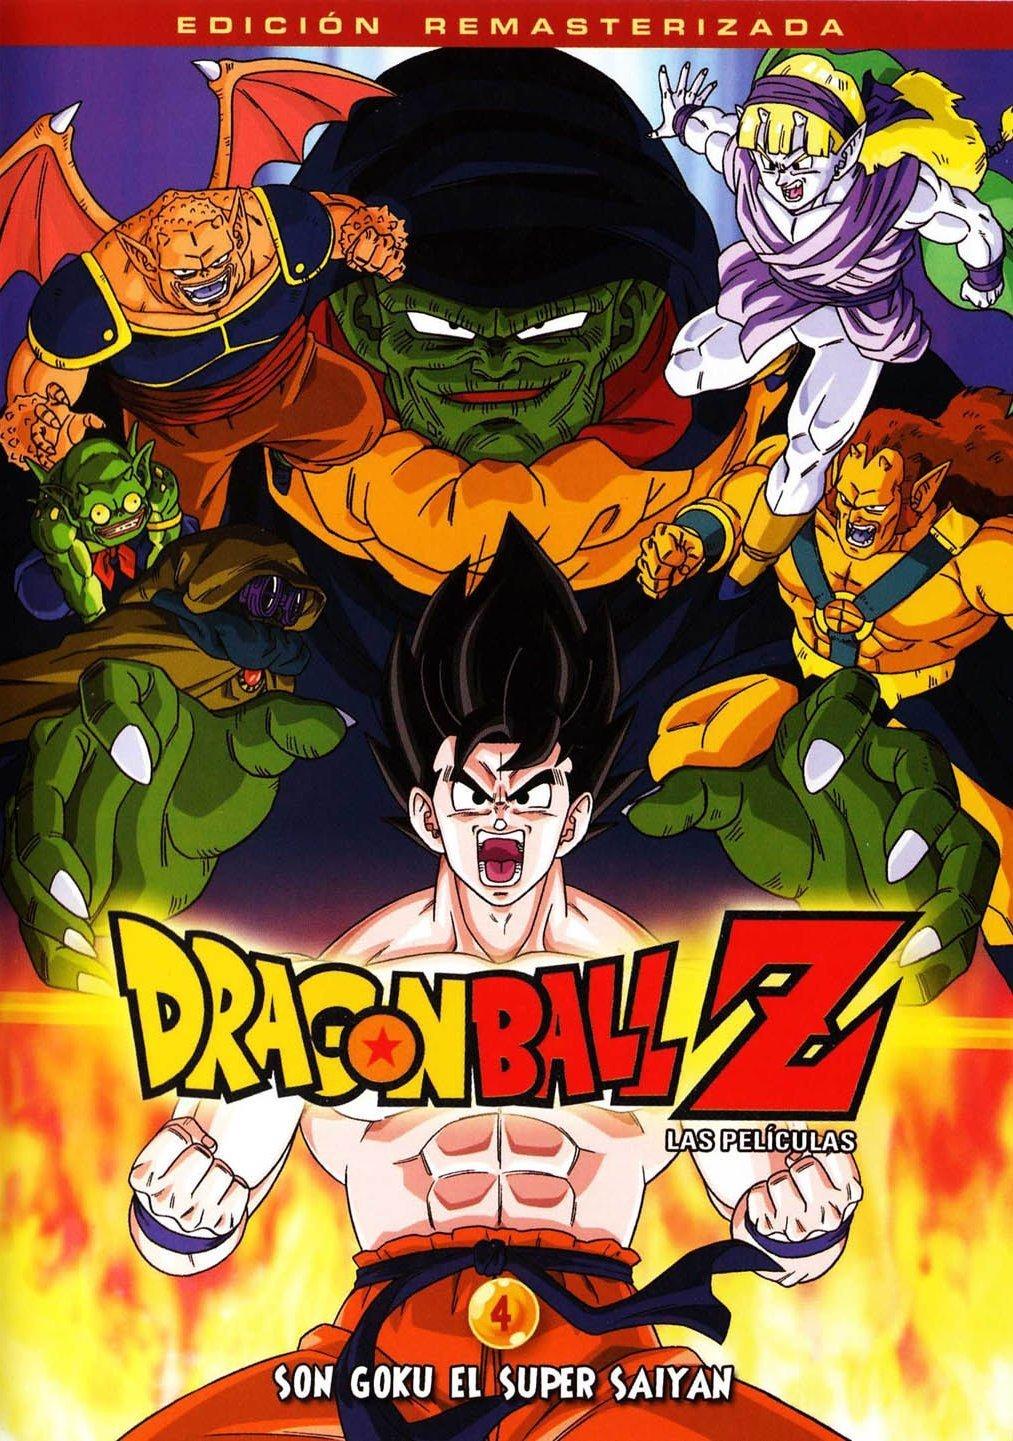 Dragon Ball Z The Movie 4 Super Saiya Son Goku ซูเปอร์ไซย่า ซงโกคู